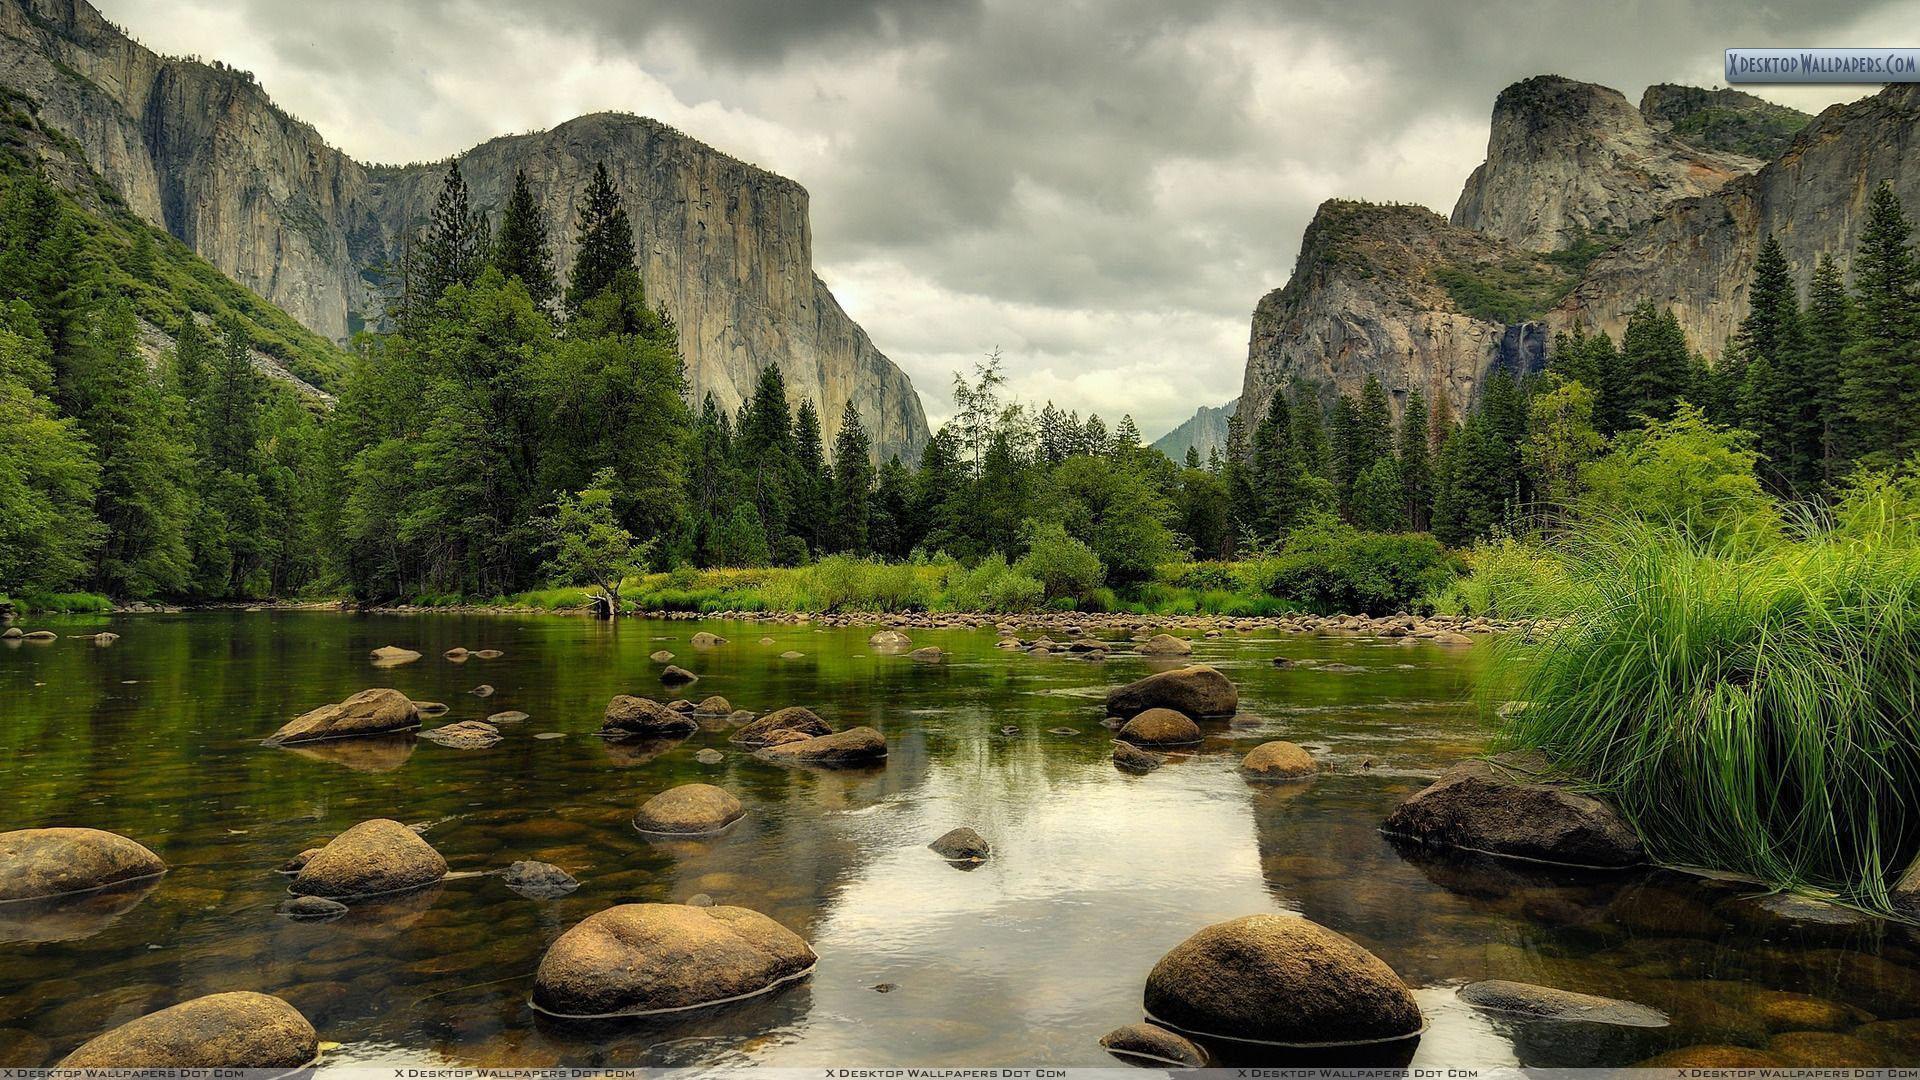 Yosemite National Park Nice Scene Wallpaper 1920x1080